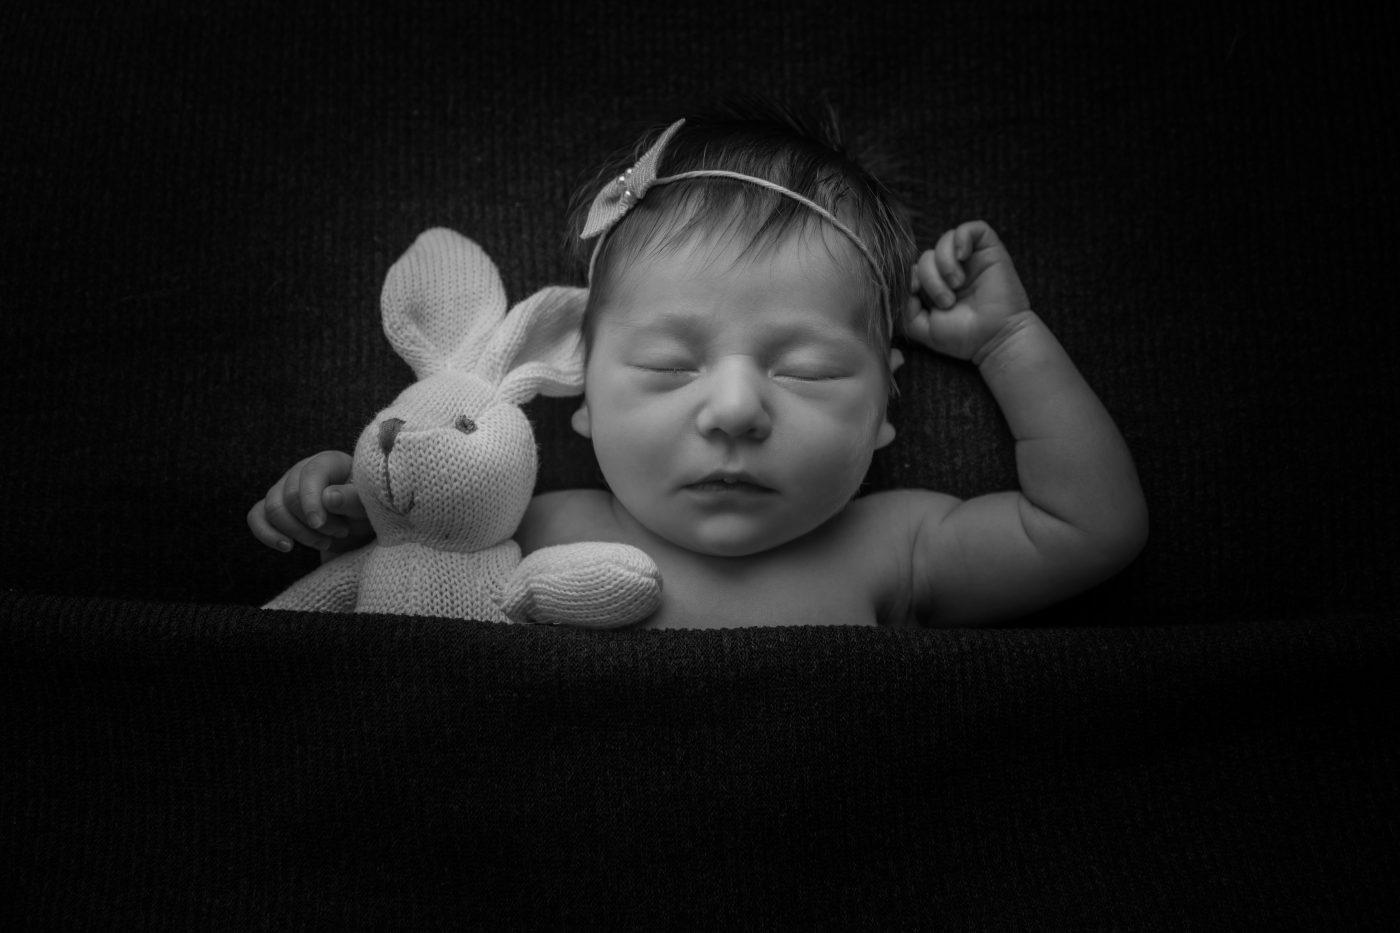 Newborn Sleeping with Bunny